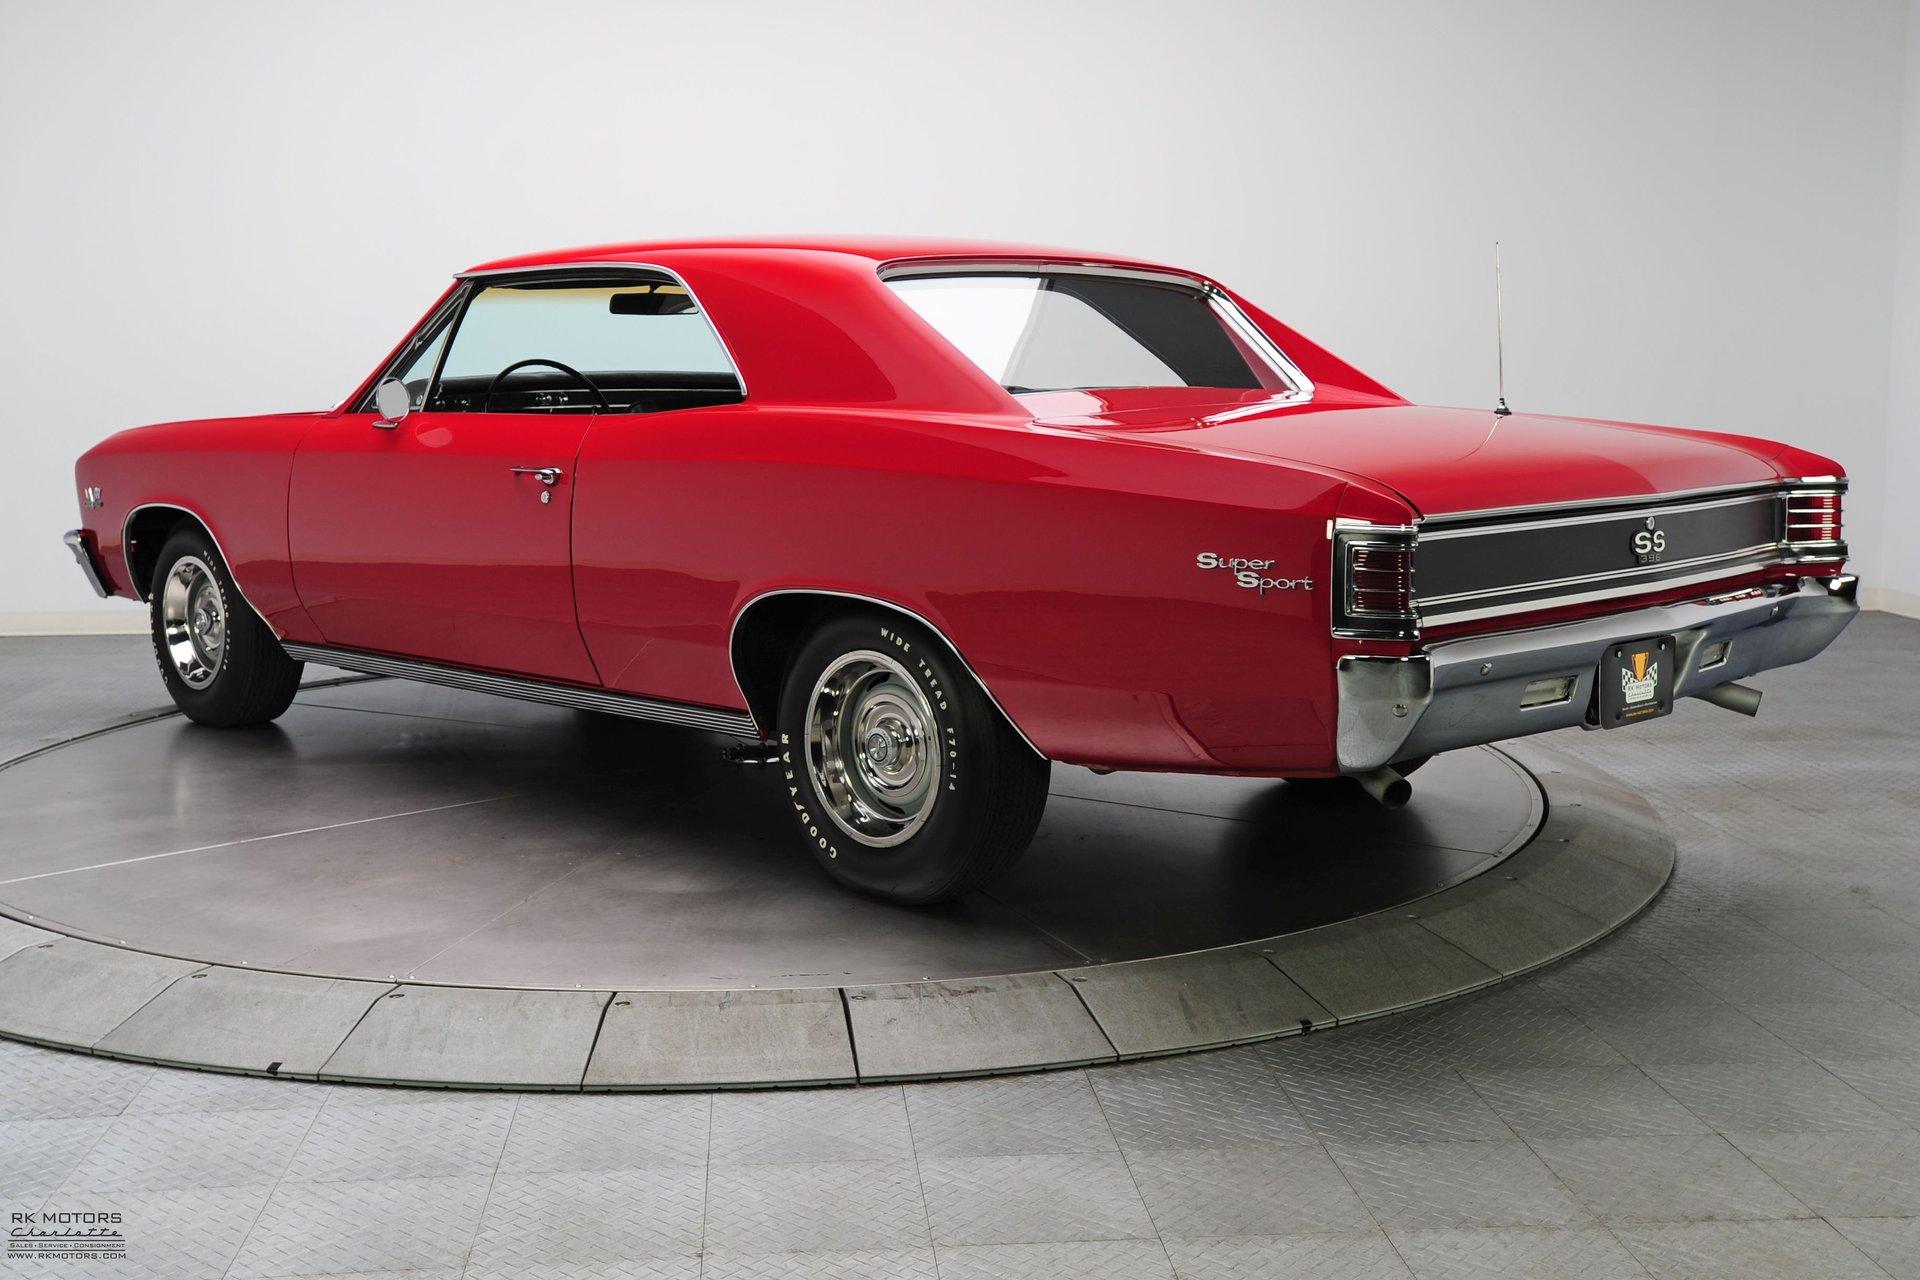 132779 1967 Chevrolet Chevelle RK Motors Classic Cars for Sale